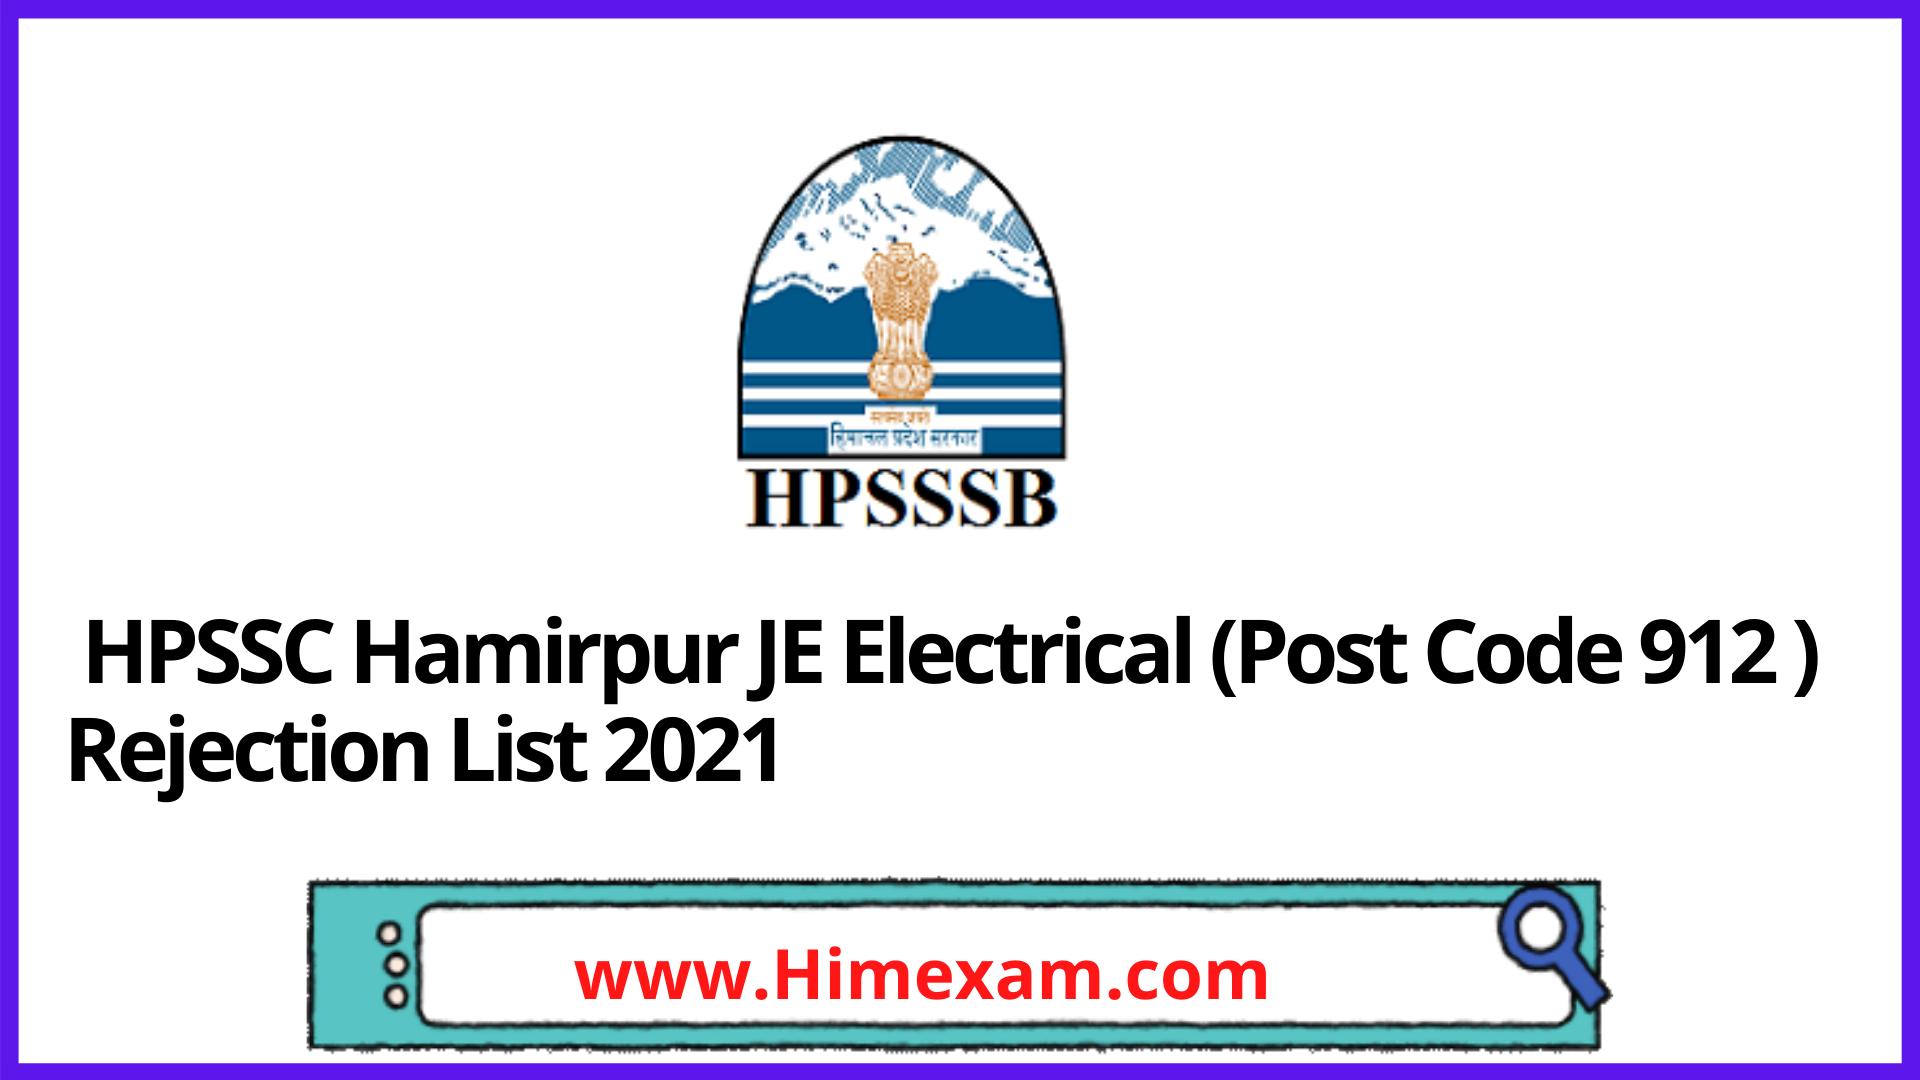 HPSSC Hamirpur JE Electrical (Post Code 912 ) Rejection List 2021